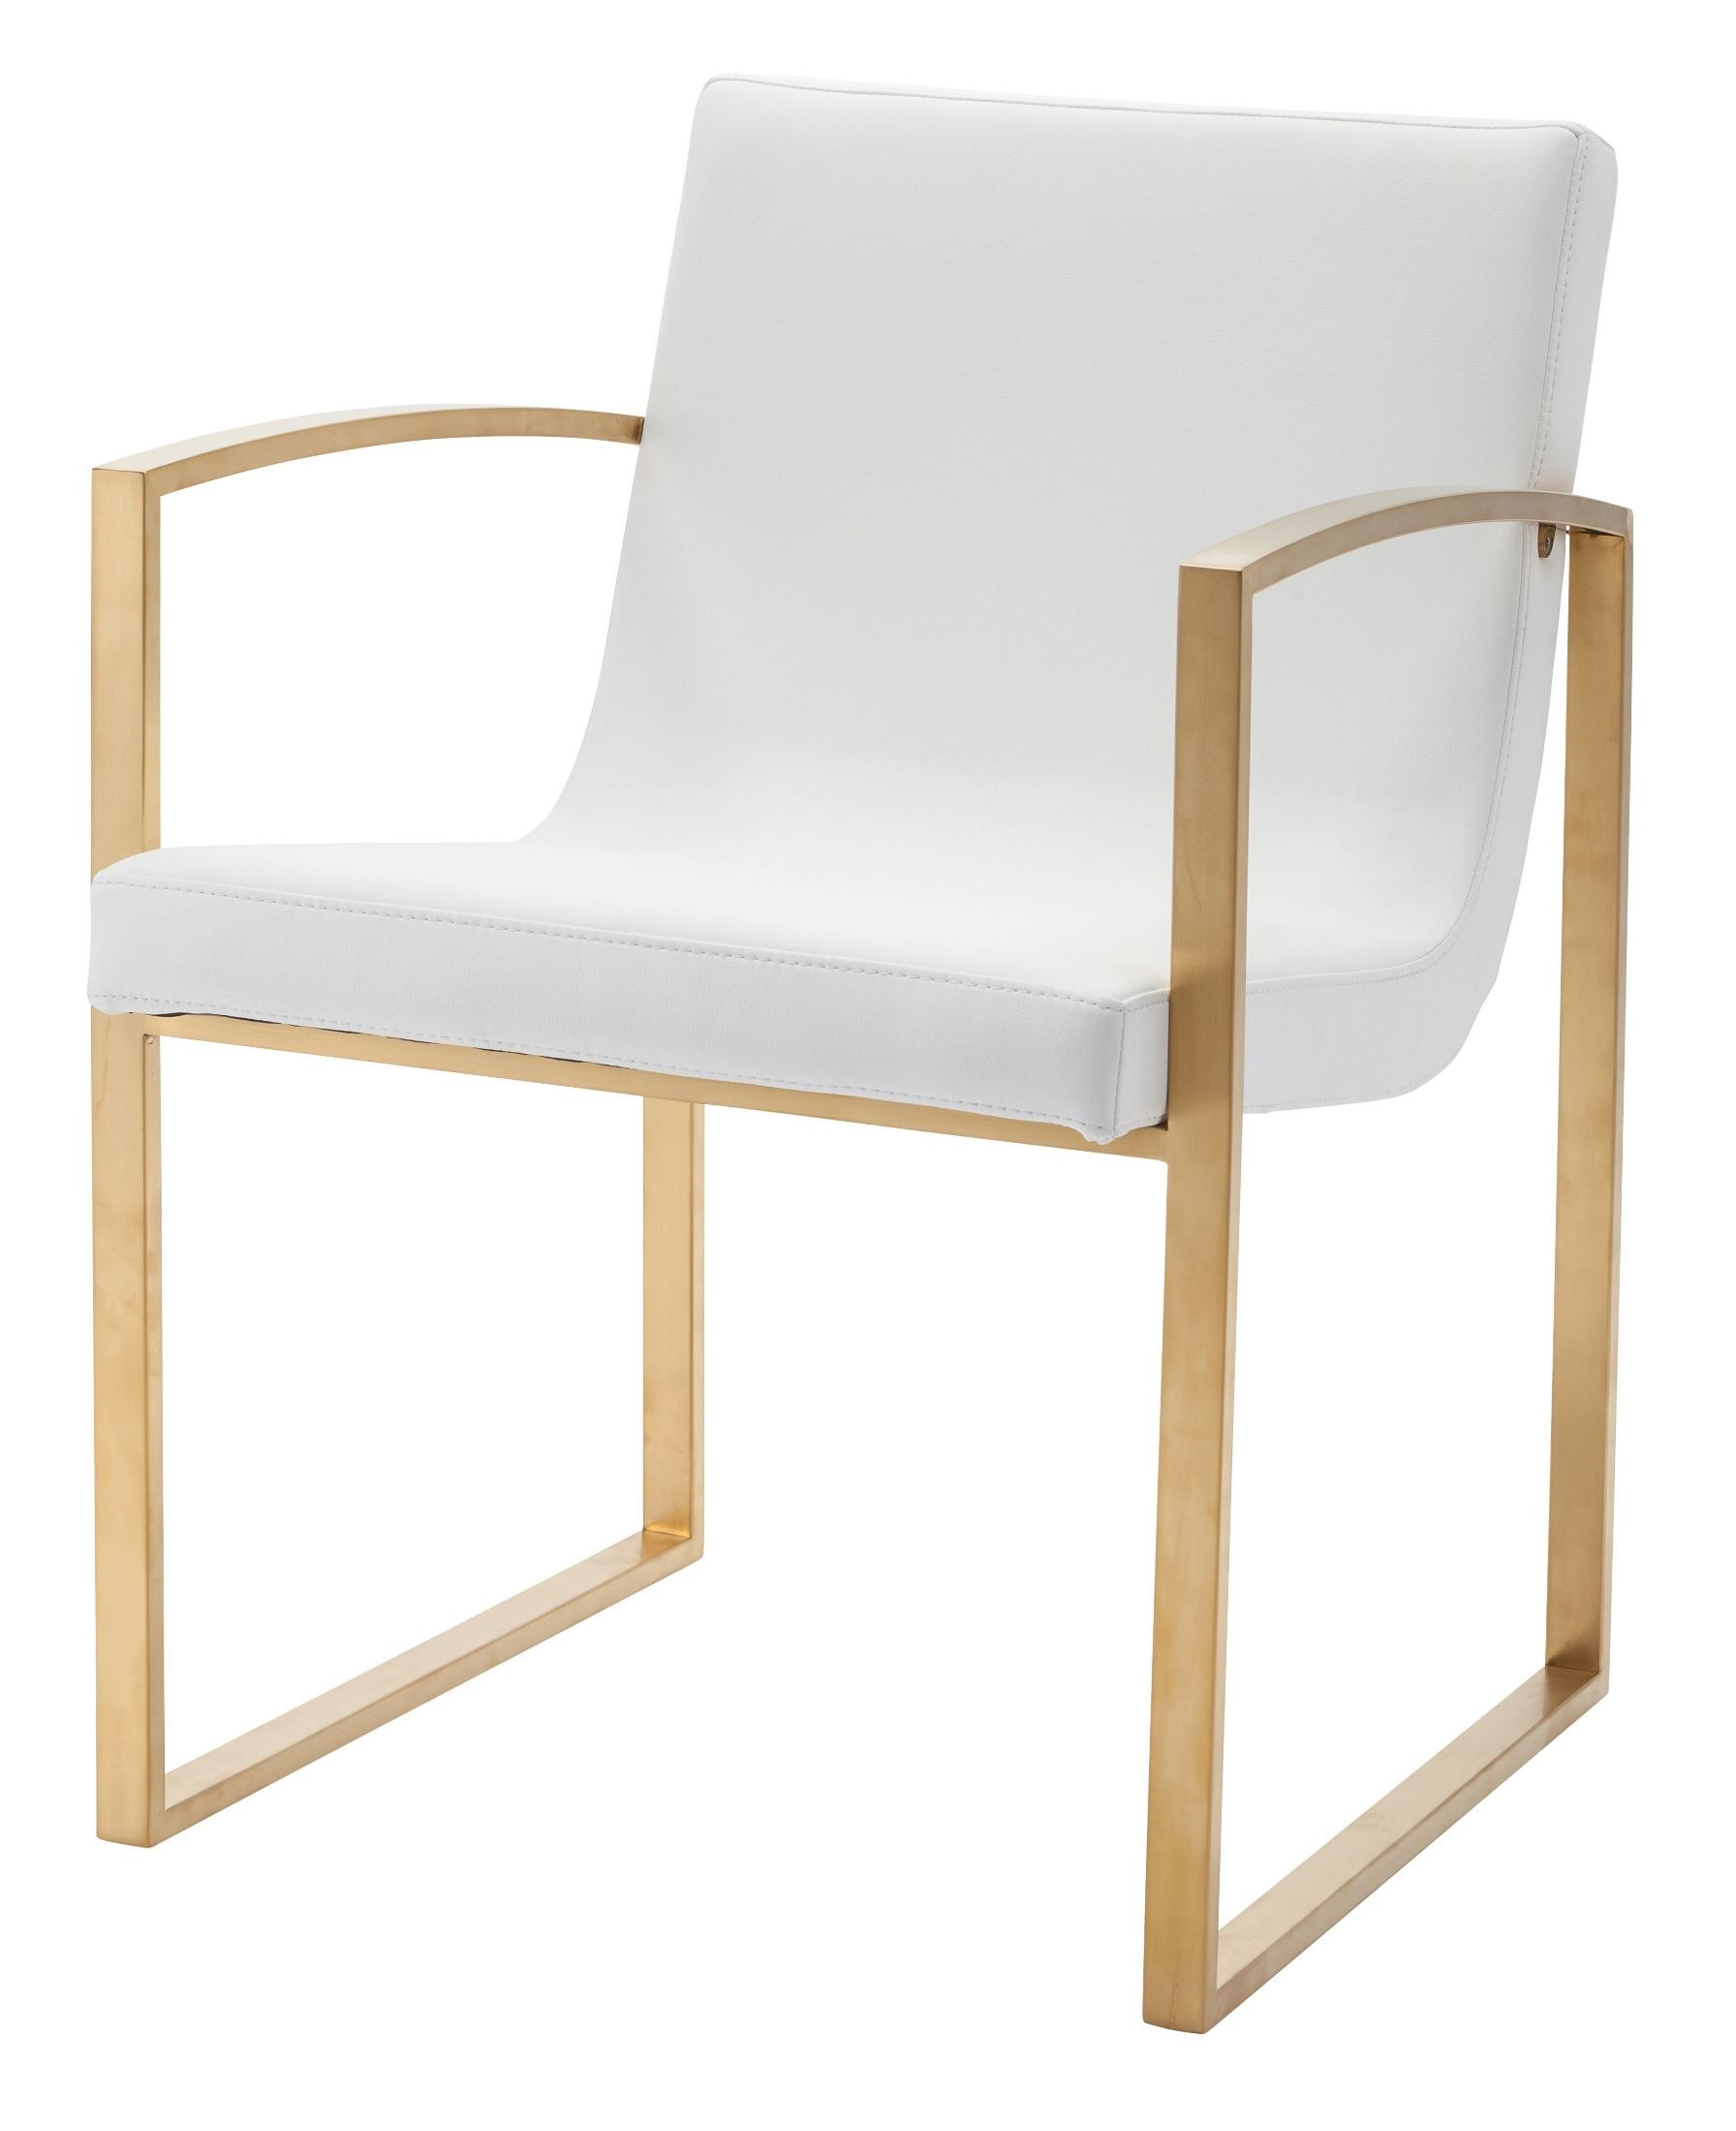 Clara White Amp Gold Naugahyde Dining Chair From Nuevo